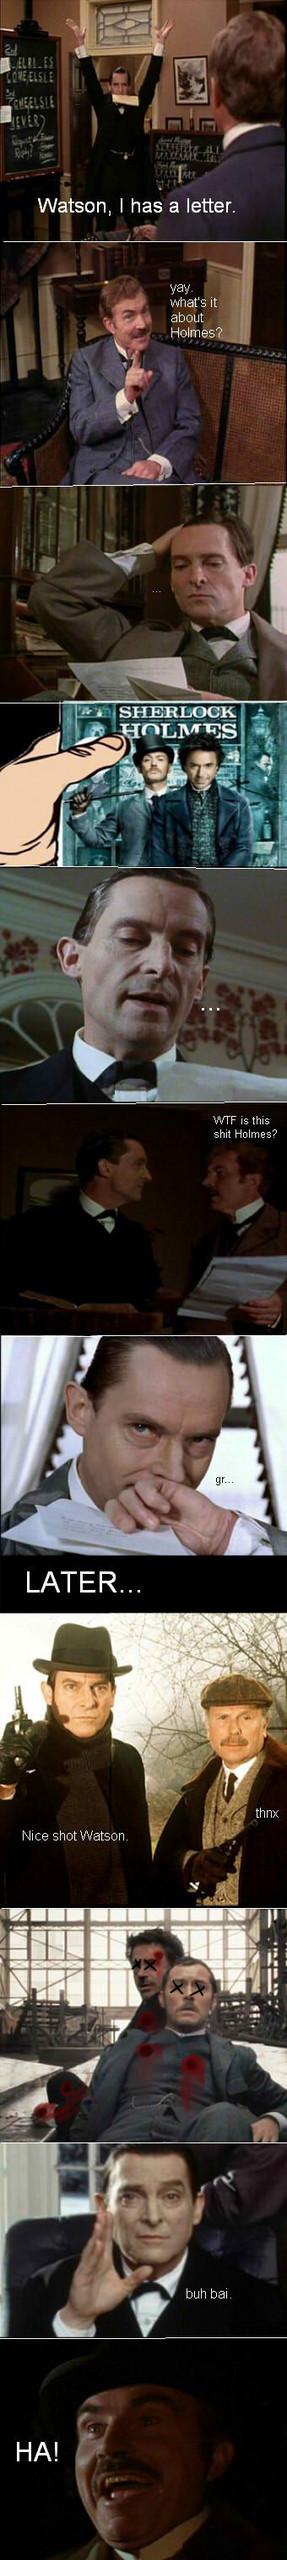 Holmes comic